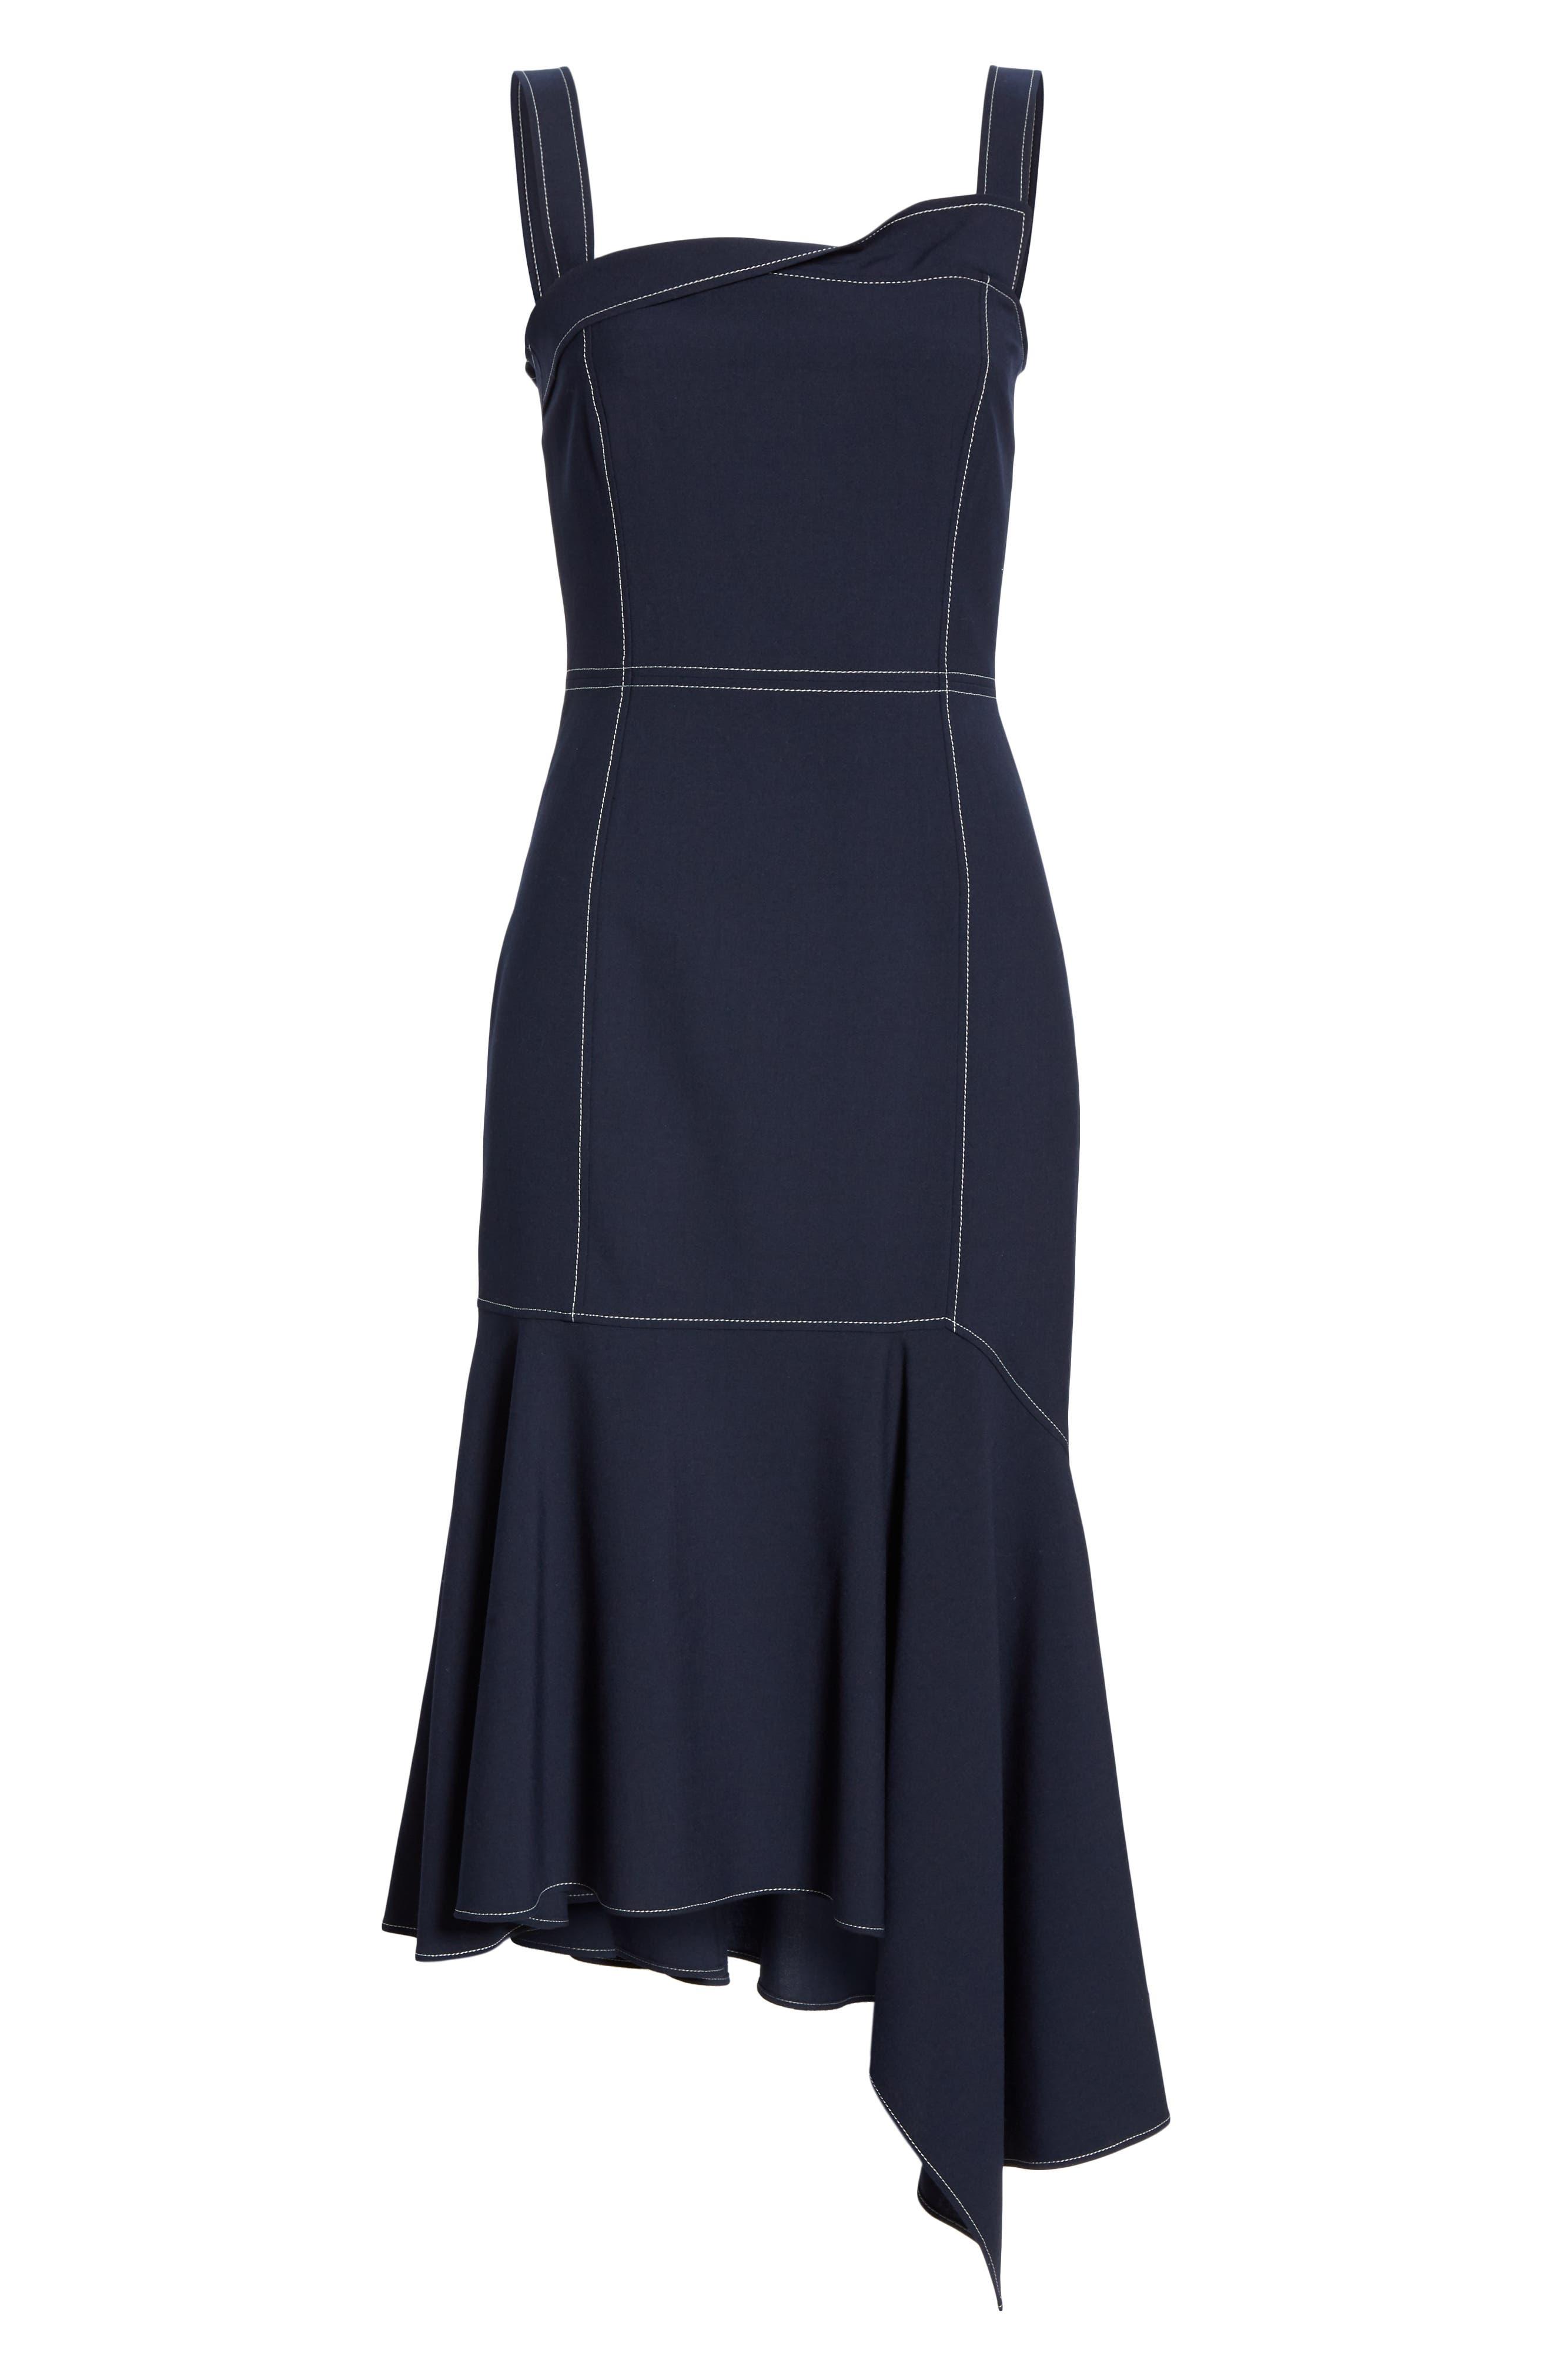 ADEAM,                             Bustier Handkerchief Dress,                             Alternate thumbnail 7, color,                             MIDNIGHT BLUE